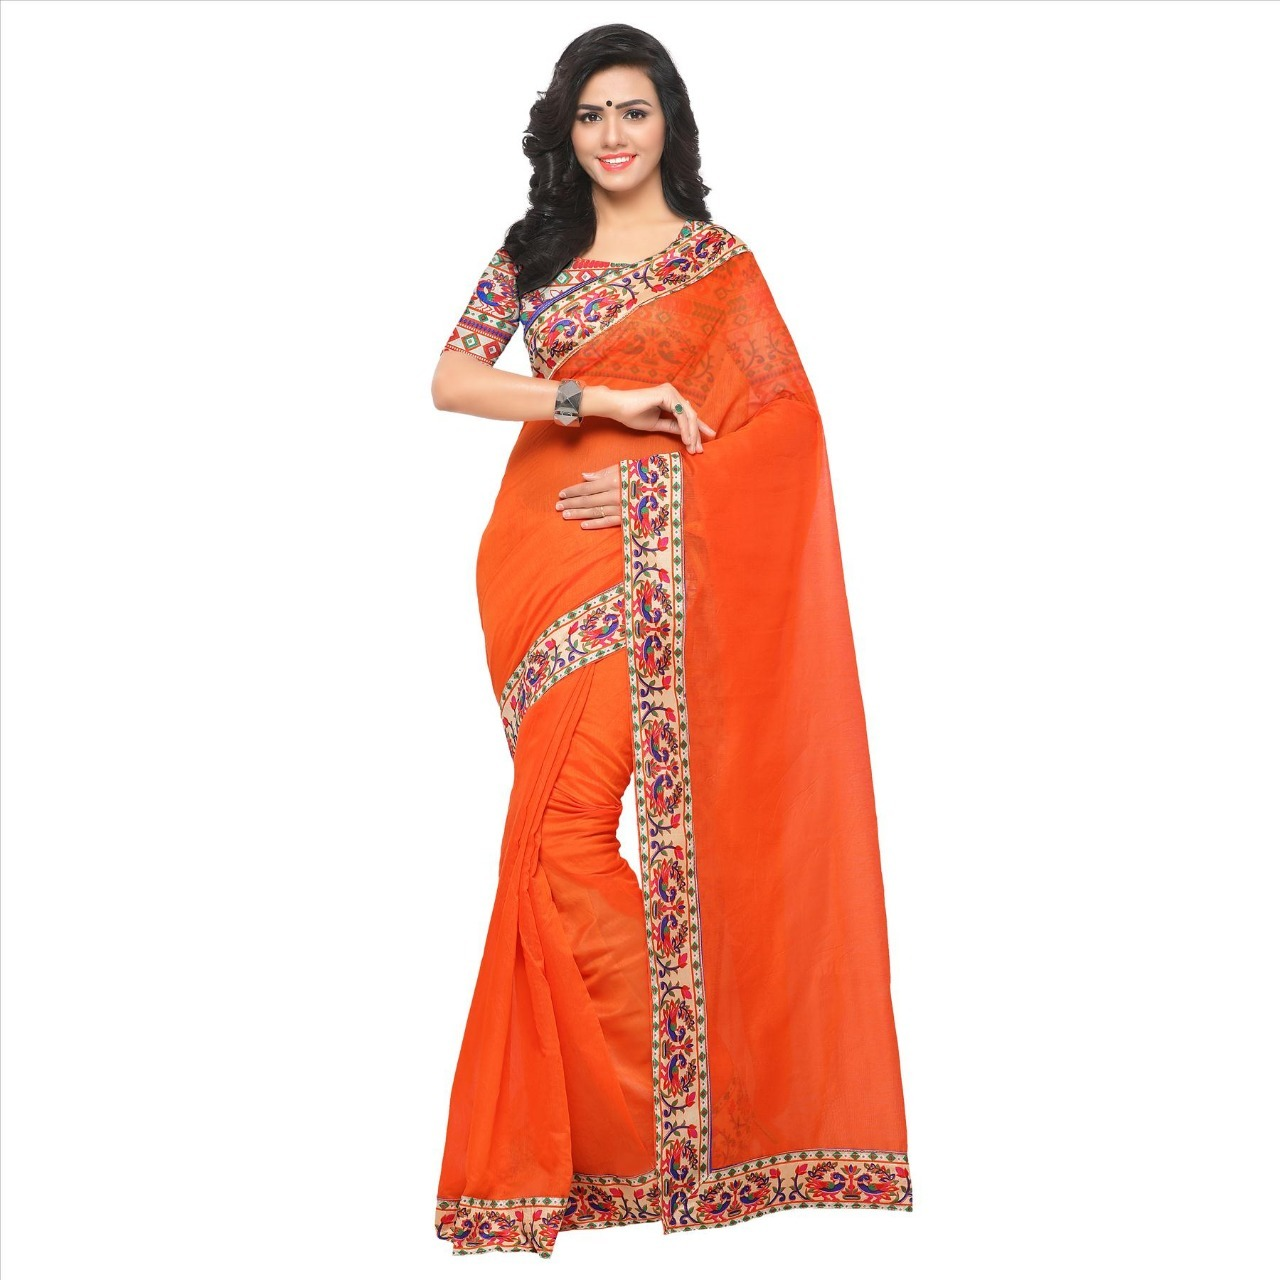 New designer chanderi saree with lace